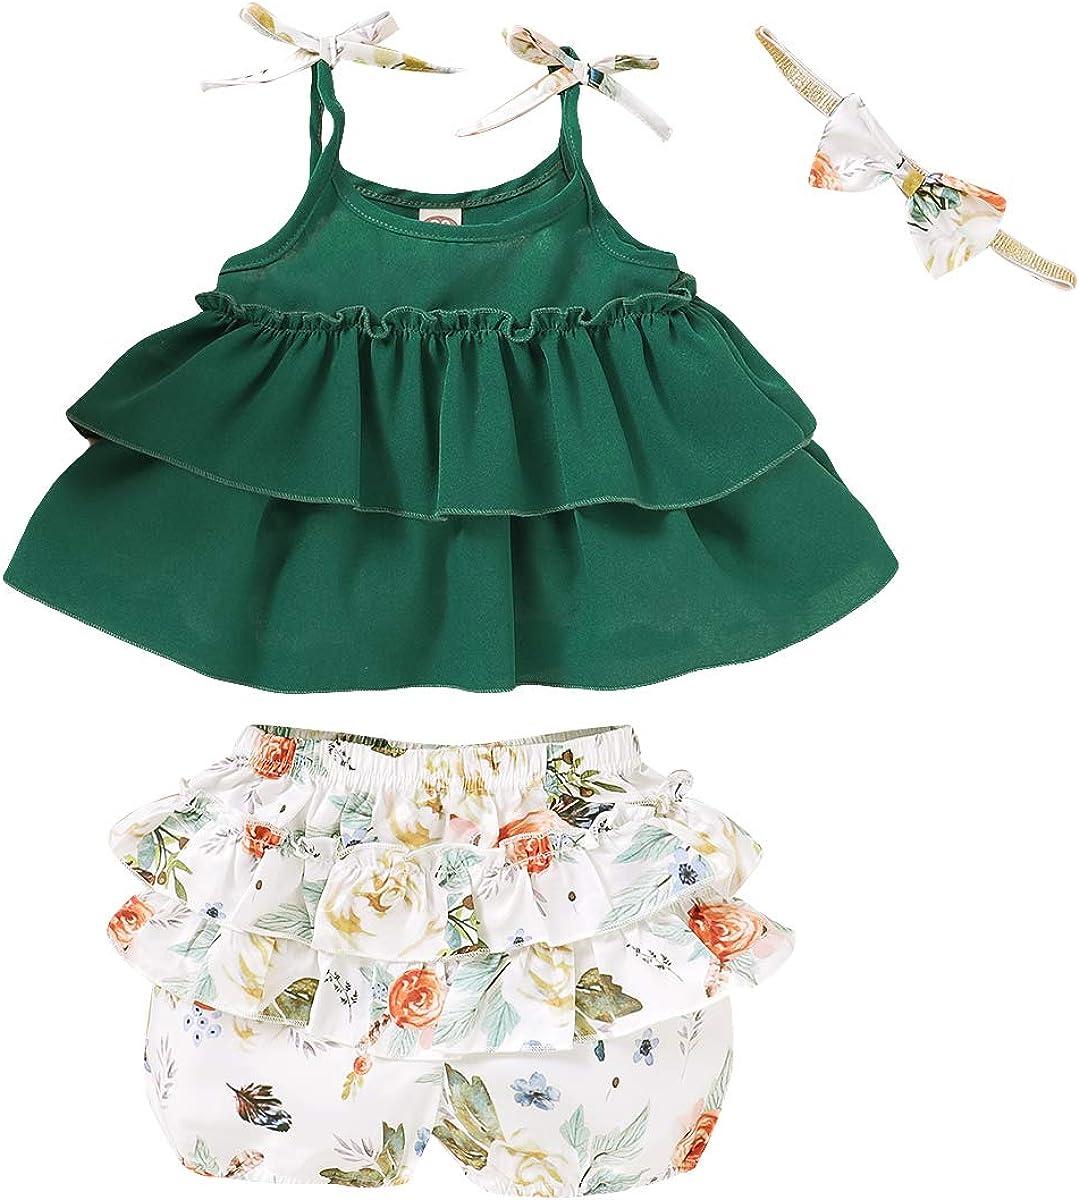 SANMIO Conjuntos de Ropa para Niñas Pequeñas, Conjunto de Pantalones Vaqueros de Flores para Niñas Bebés Volantes Conjuntos de Manga Corta de Manga Larga